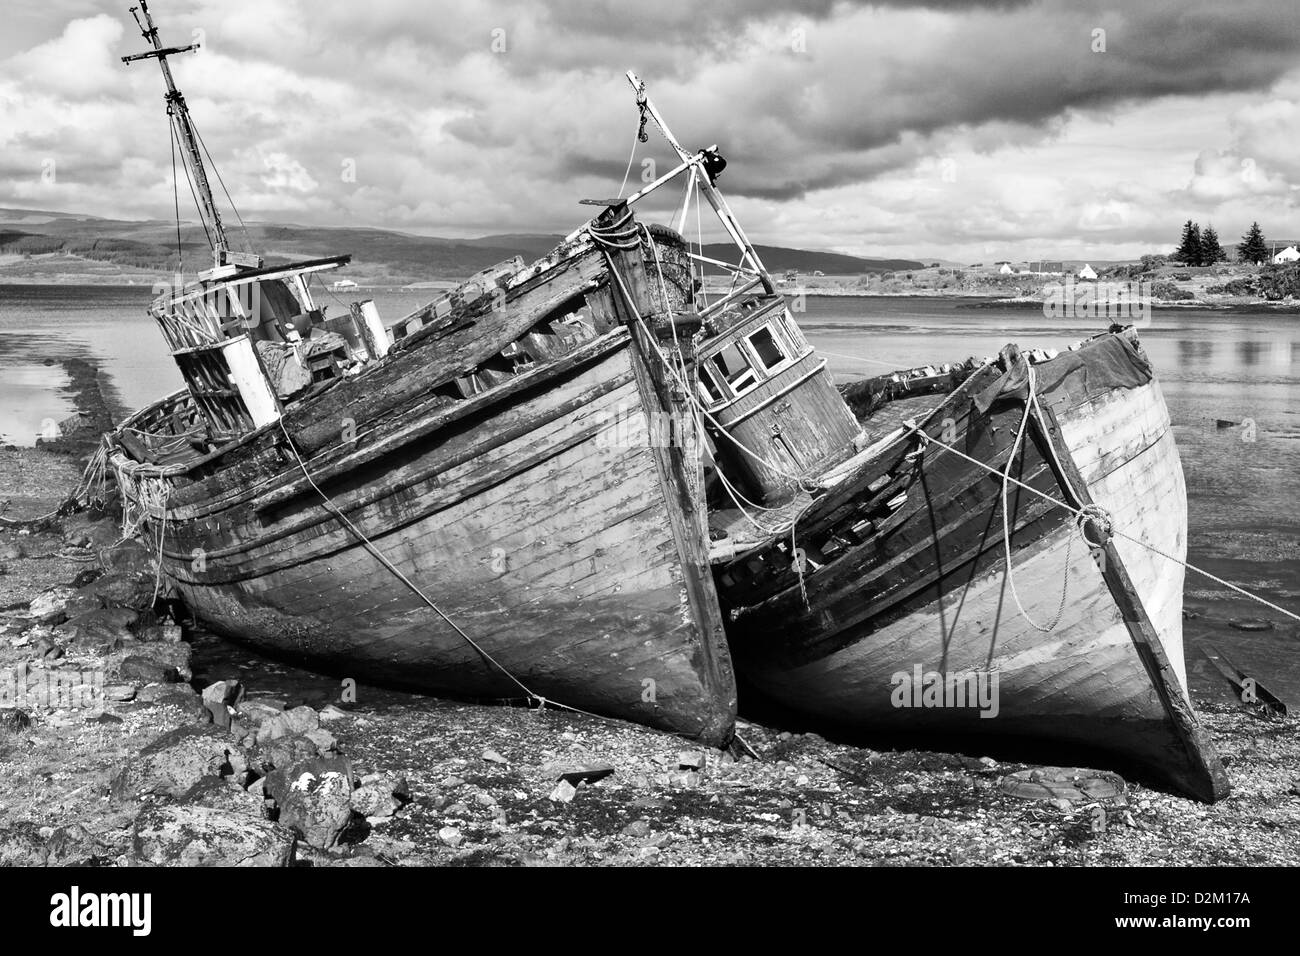 Beached fishing boats wrecks near Salen on the Isle of Mull, Inner Hebrides, Scotland - Stock Image